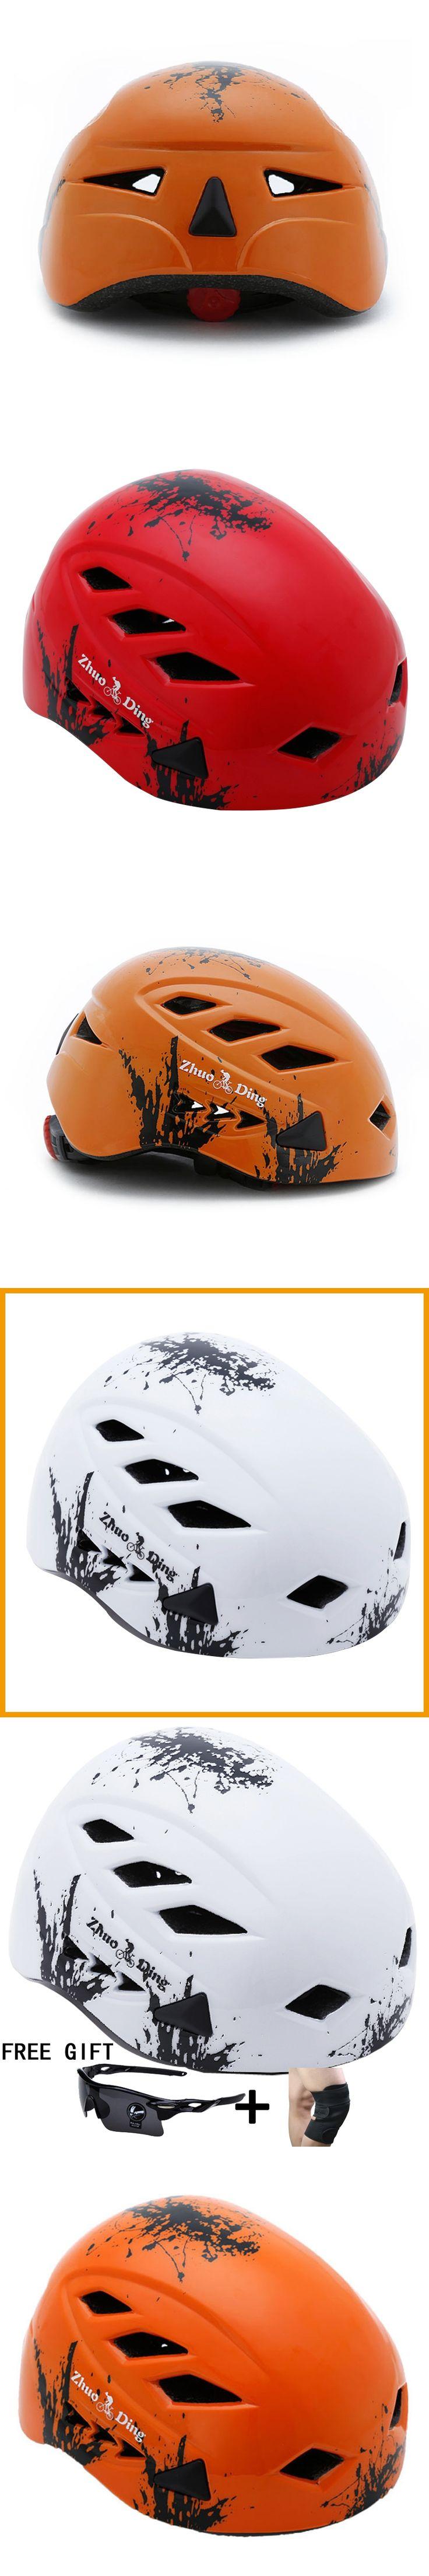 Rock Climbing Mountain Climbing Helmet Integrally-molded Ultralight  Cycling Helmet Breathable Men and women  Climbing Bicycle